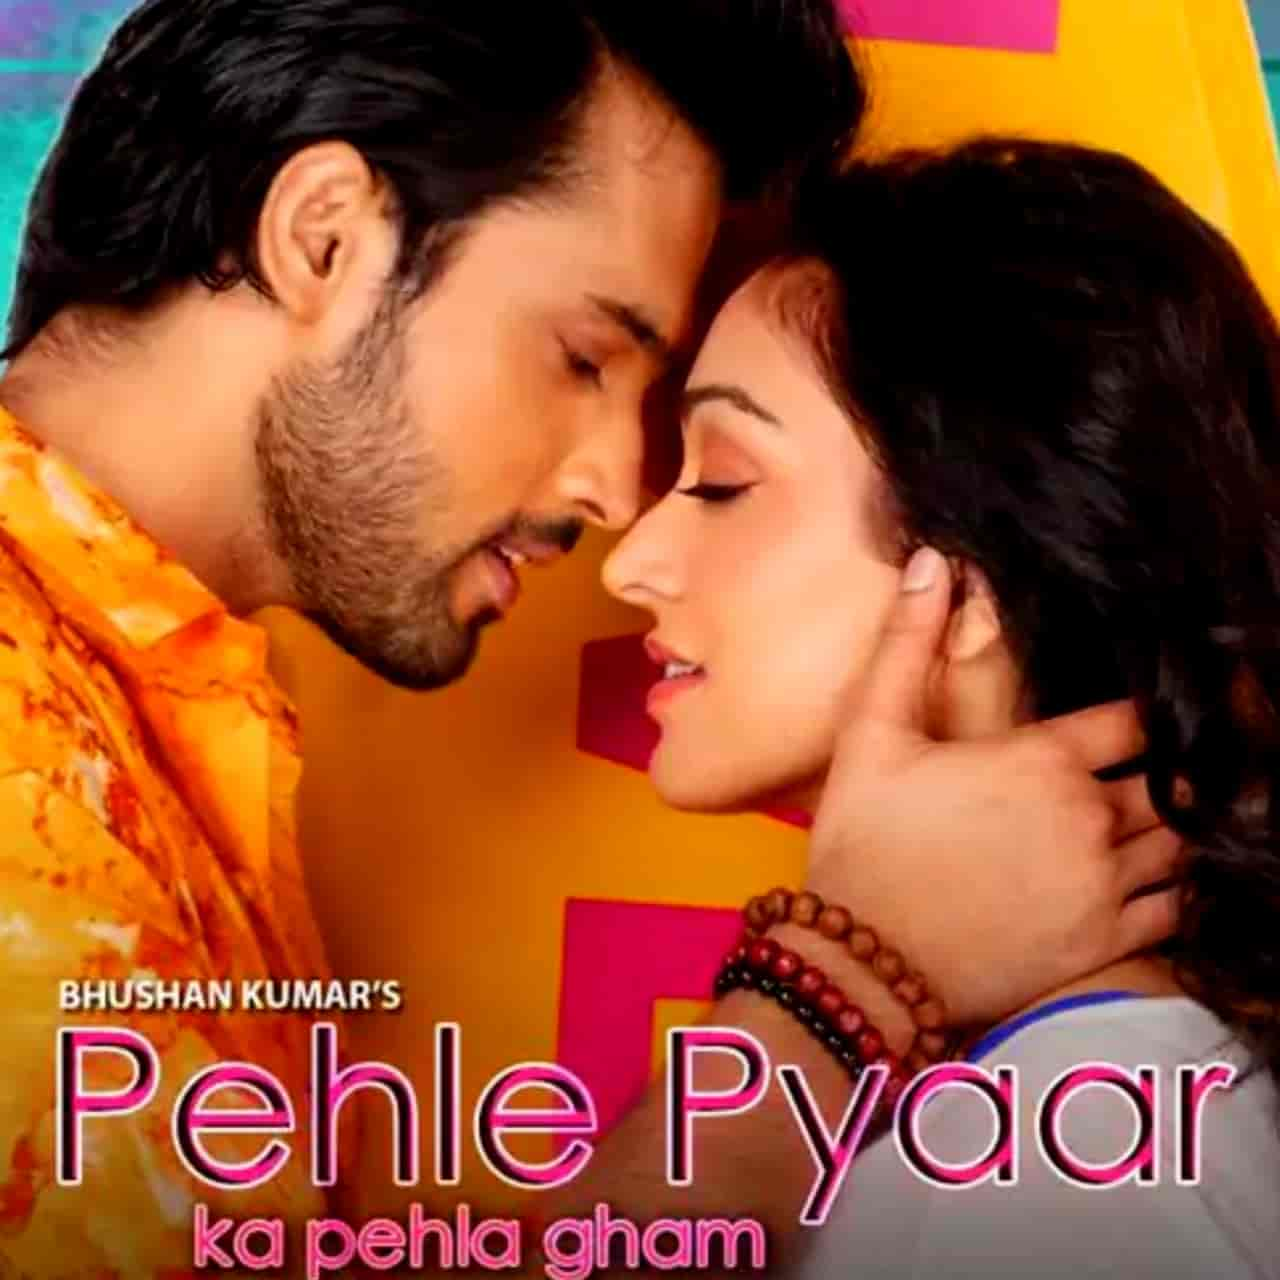 Pehle Pyaar Ka Pehla Gham Love Song Lyrics, Sung by Jubin Nautiyal and Tulsi Kumar.